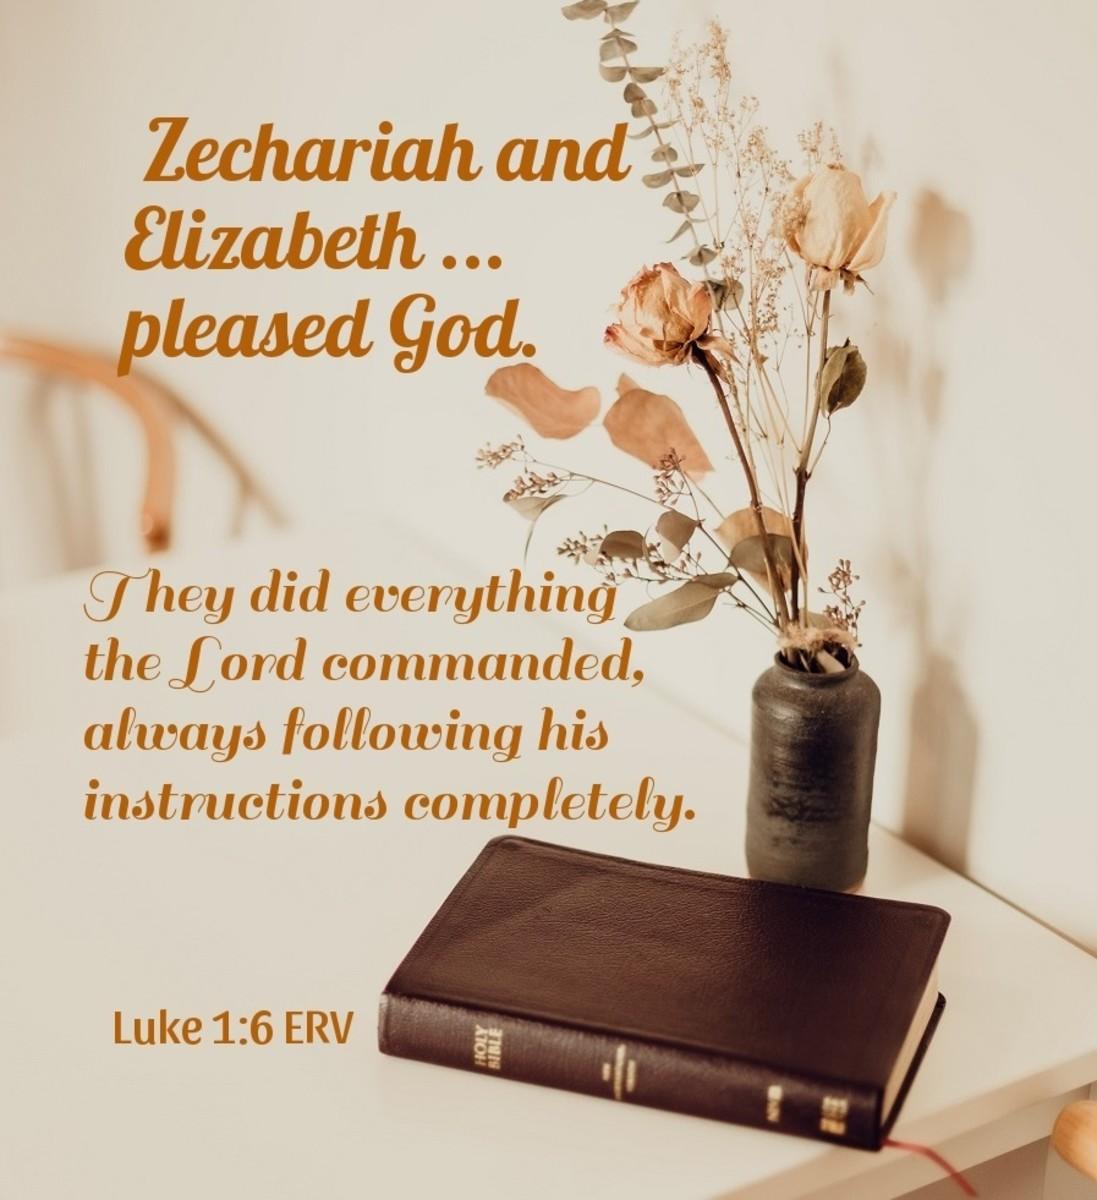 Zechariah and Elizabeth pleased God.